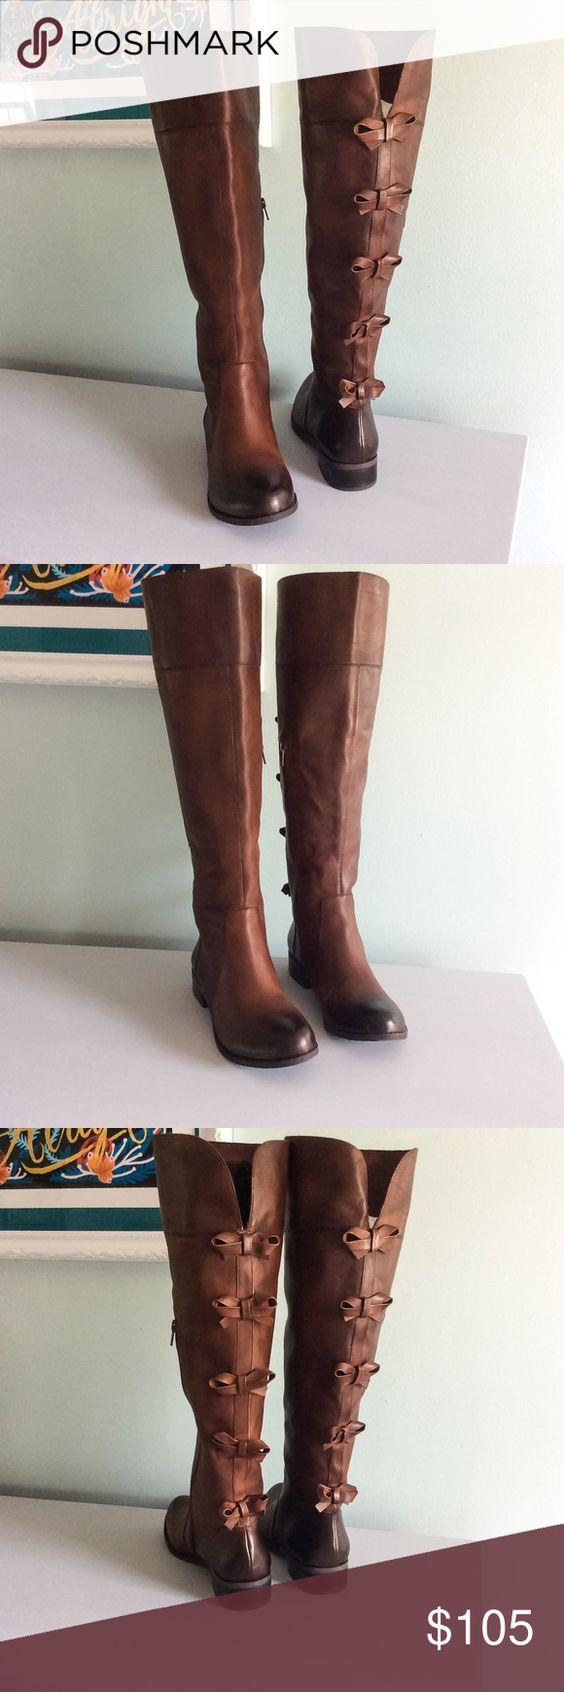 nib gianni bini bow back boots sz 9 nwt